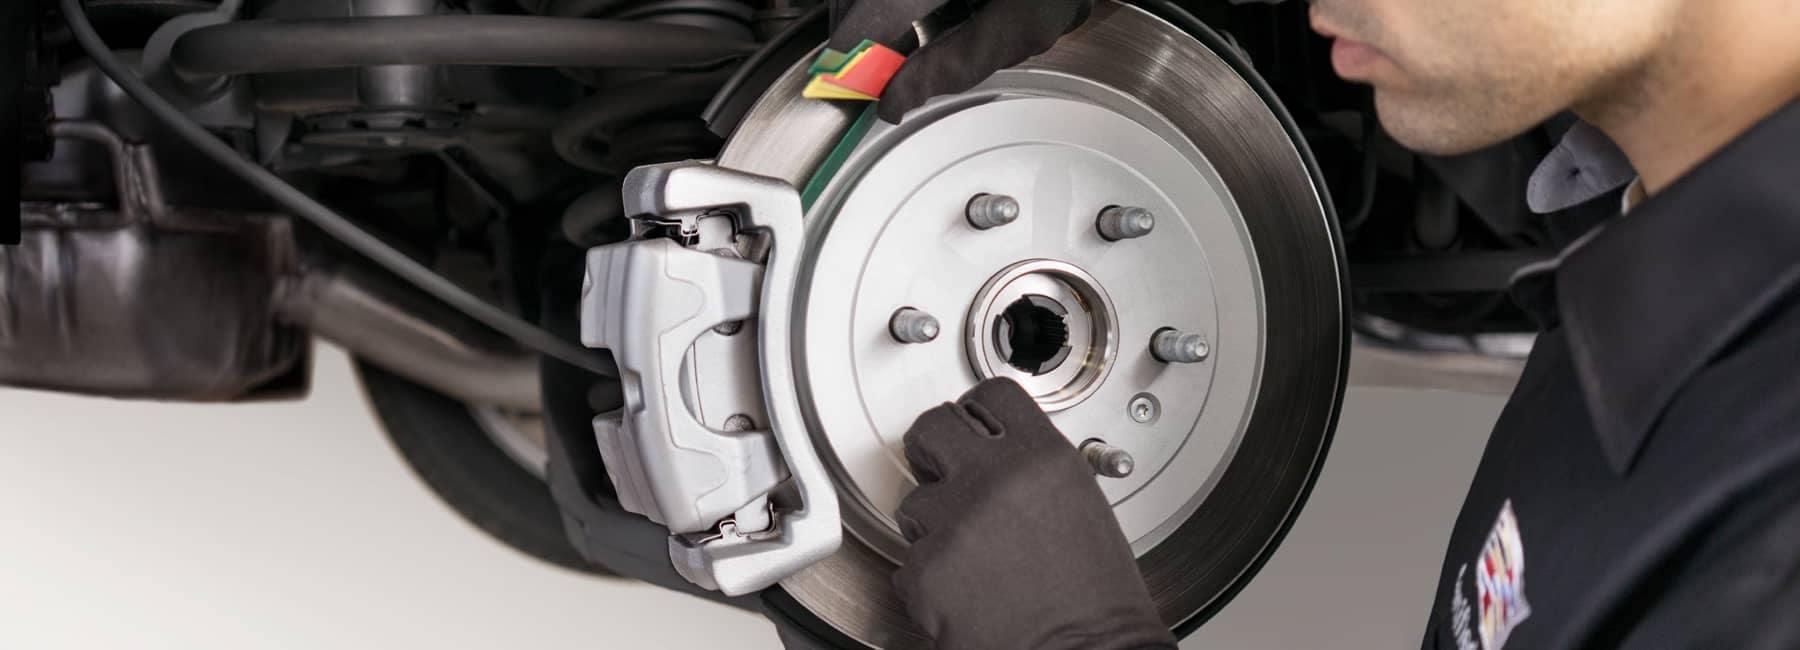 GM Cadillac Service Technician Rotors and Brakes